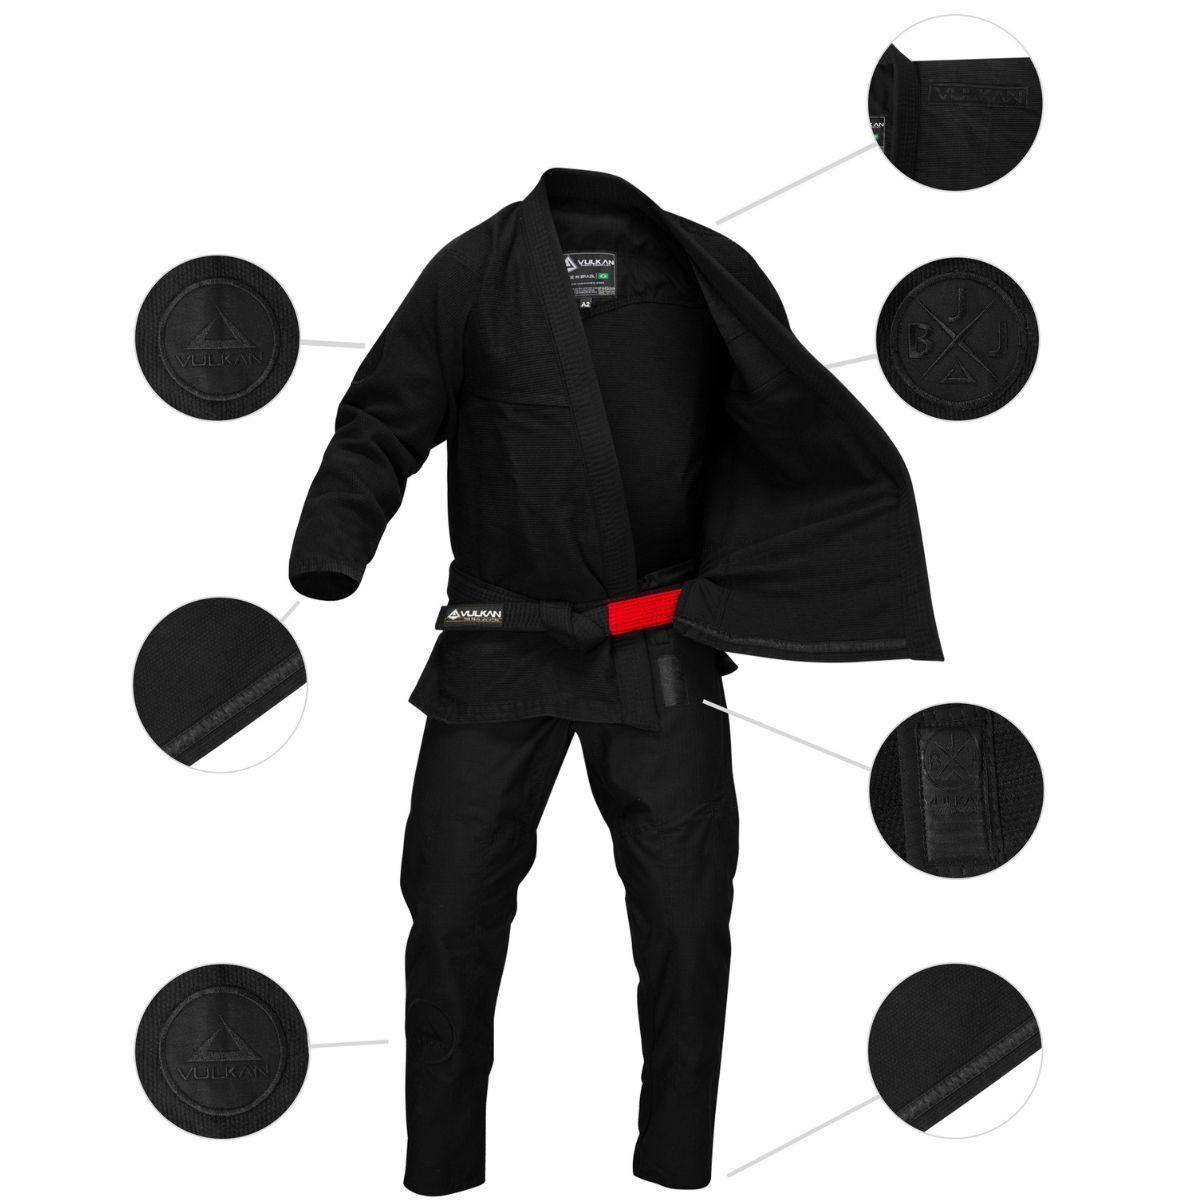 Kimono Vulkan Pro Stealth Para Jiu Jitsu Preto Profissional Adulto - Pro Stealth